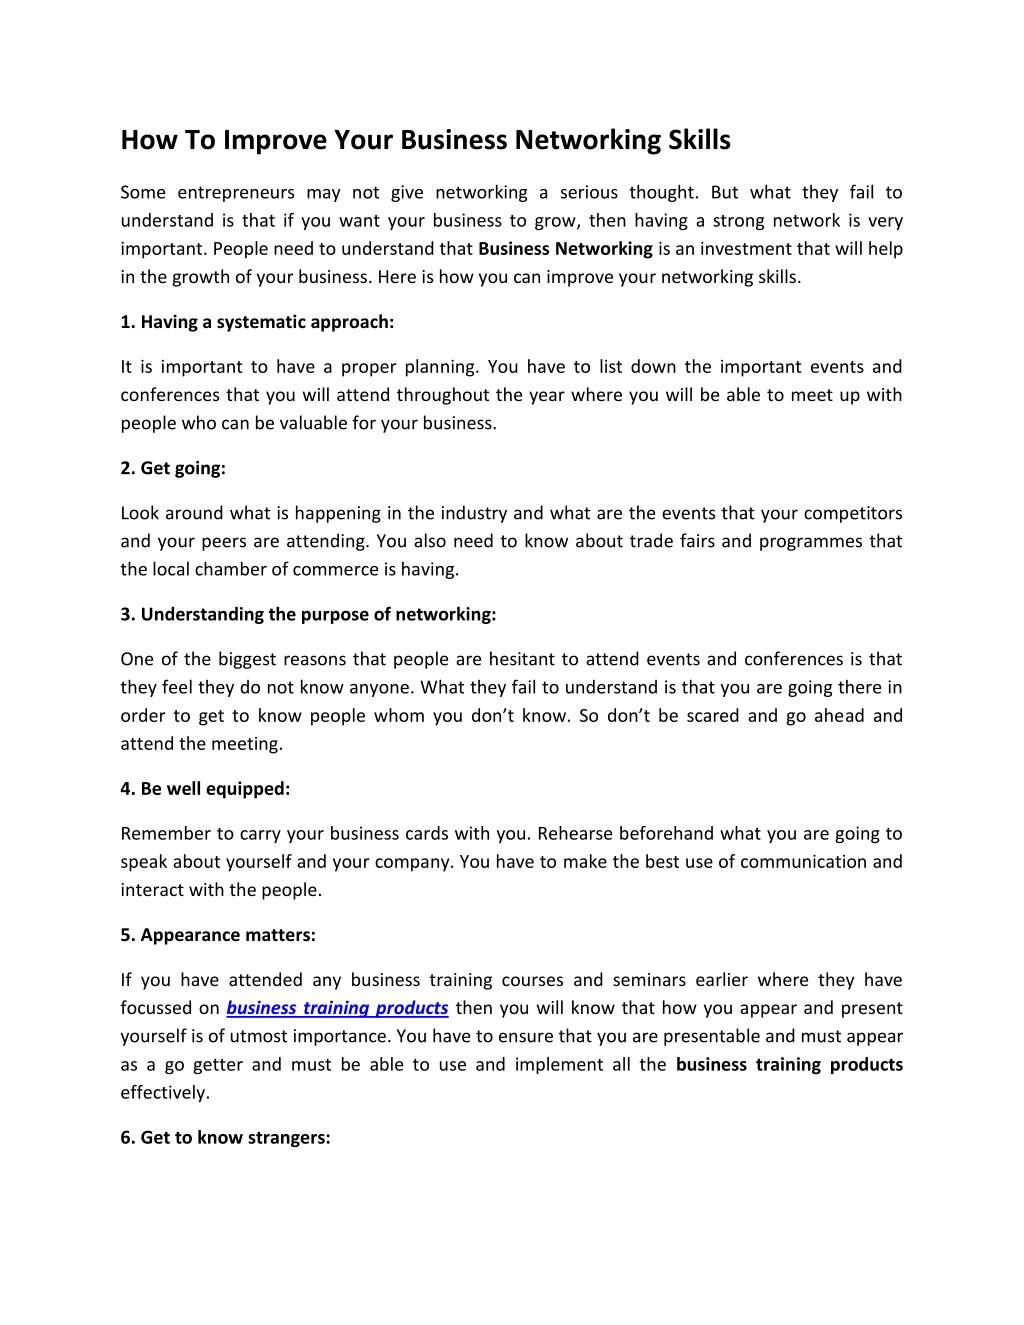 networking skills training